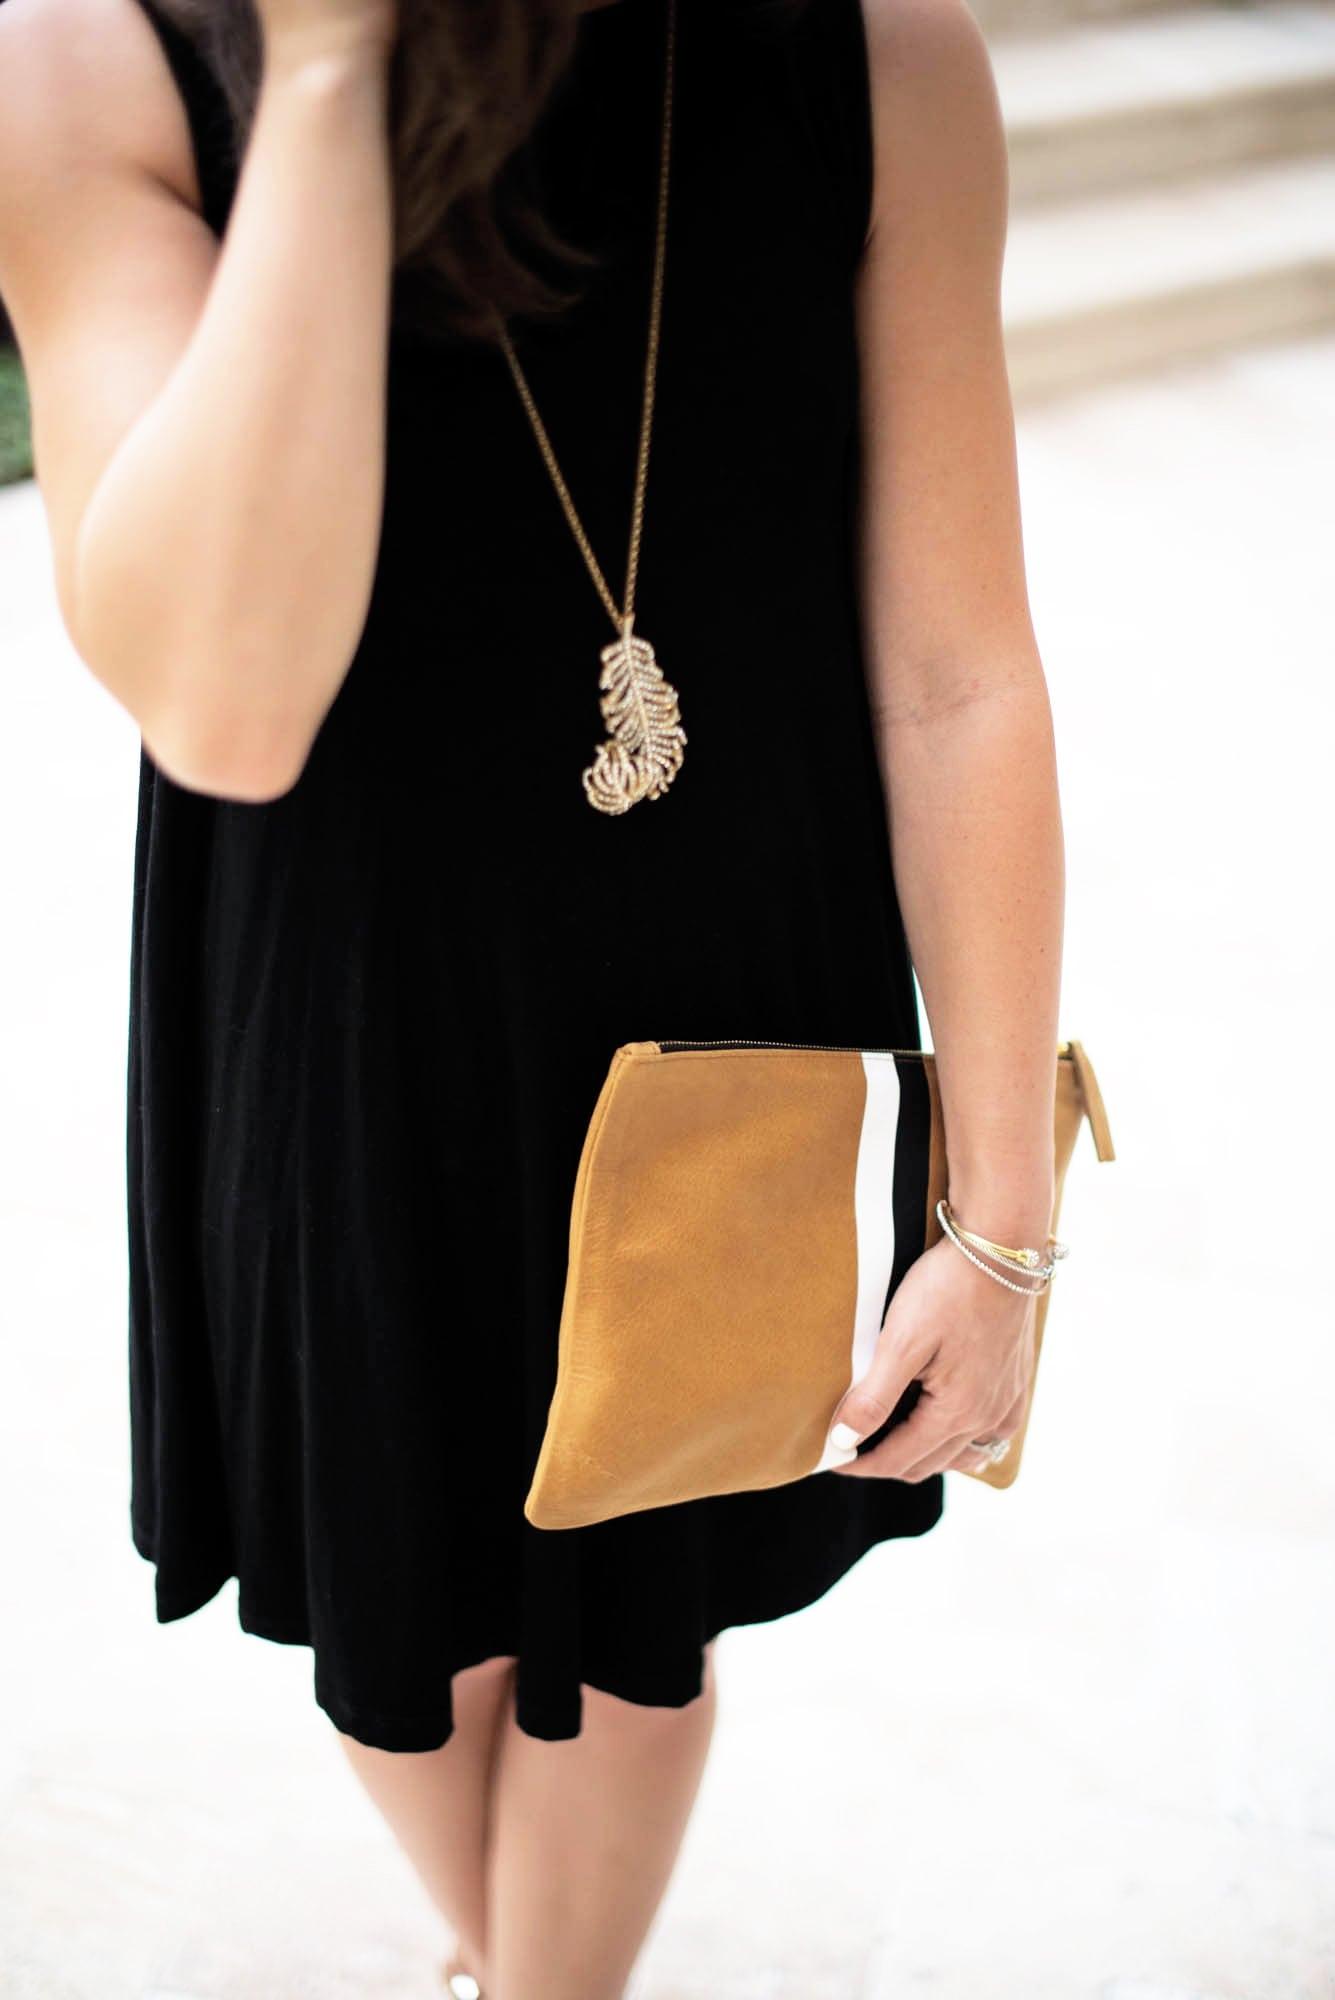 ASOS_Black_Dress4